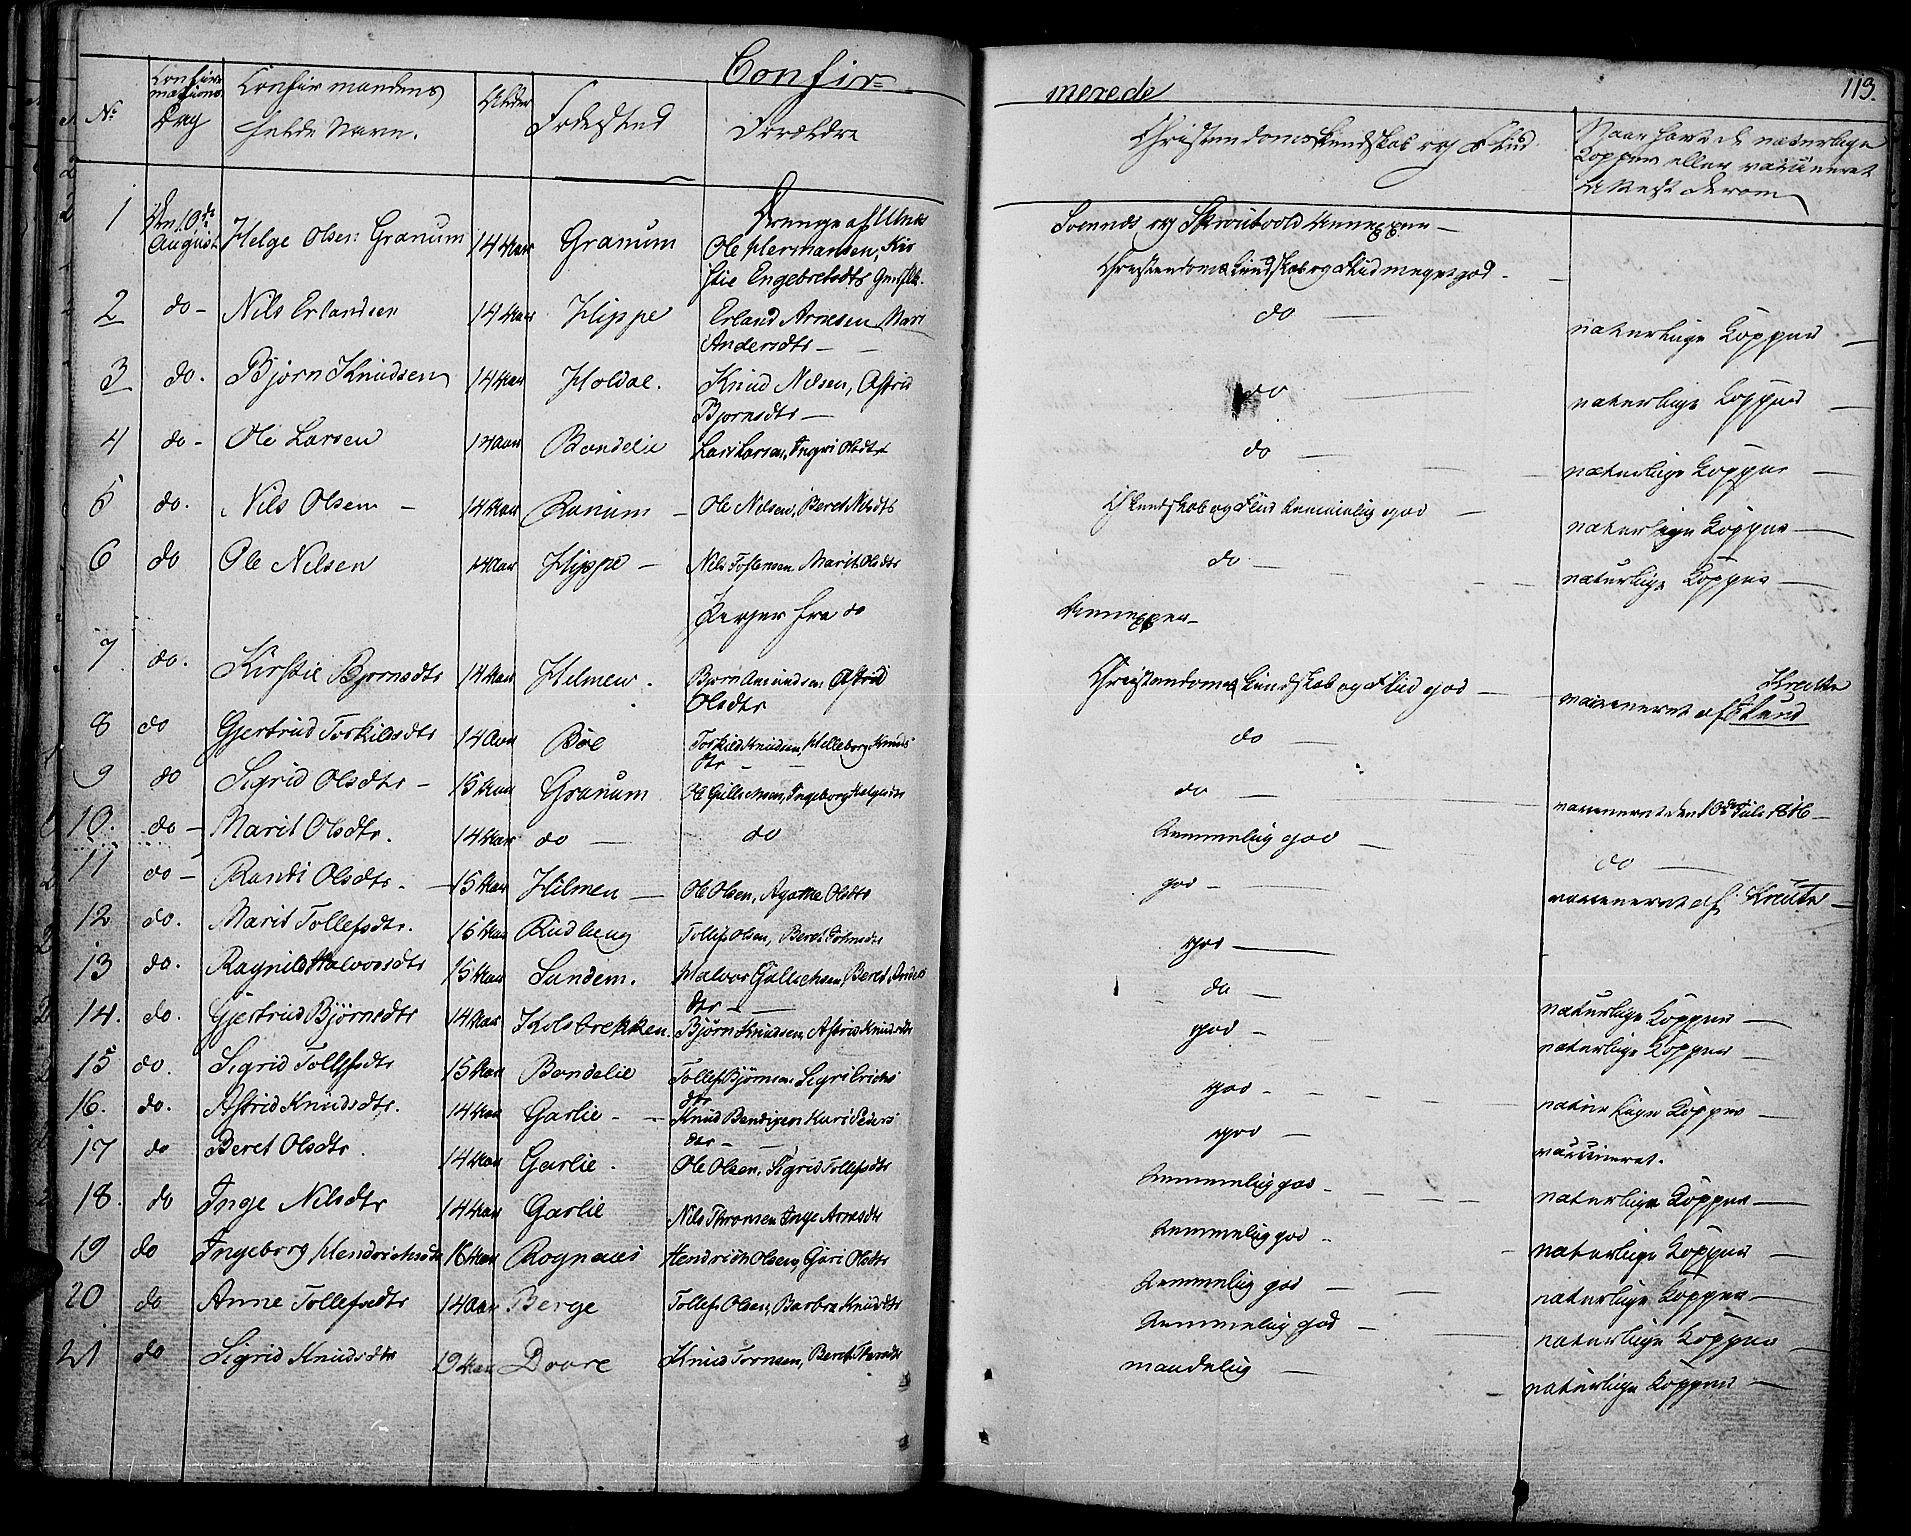 SAH, Nord-Aurdal prestekontor, Ministerialbok nr. 3, 1828-1841, s. 113